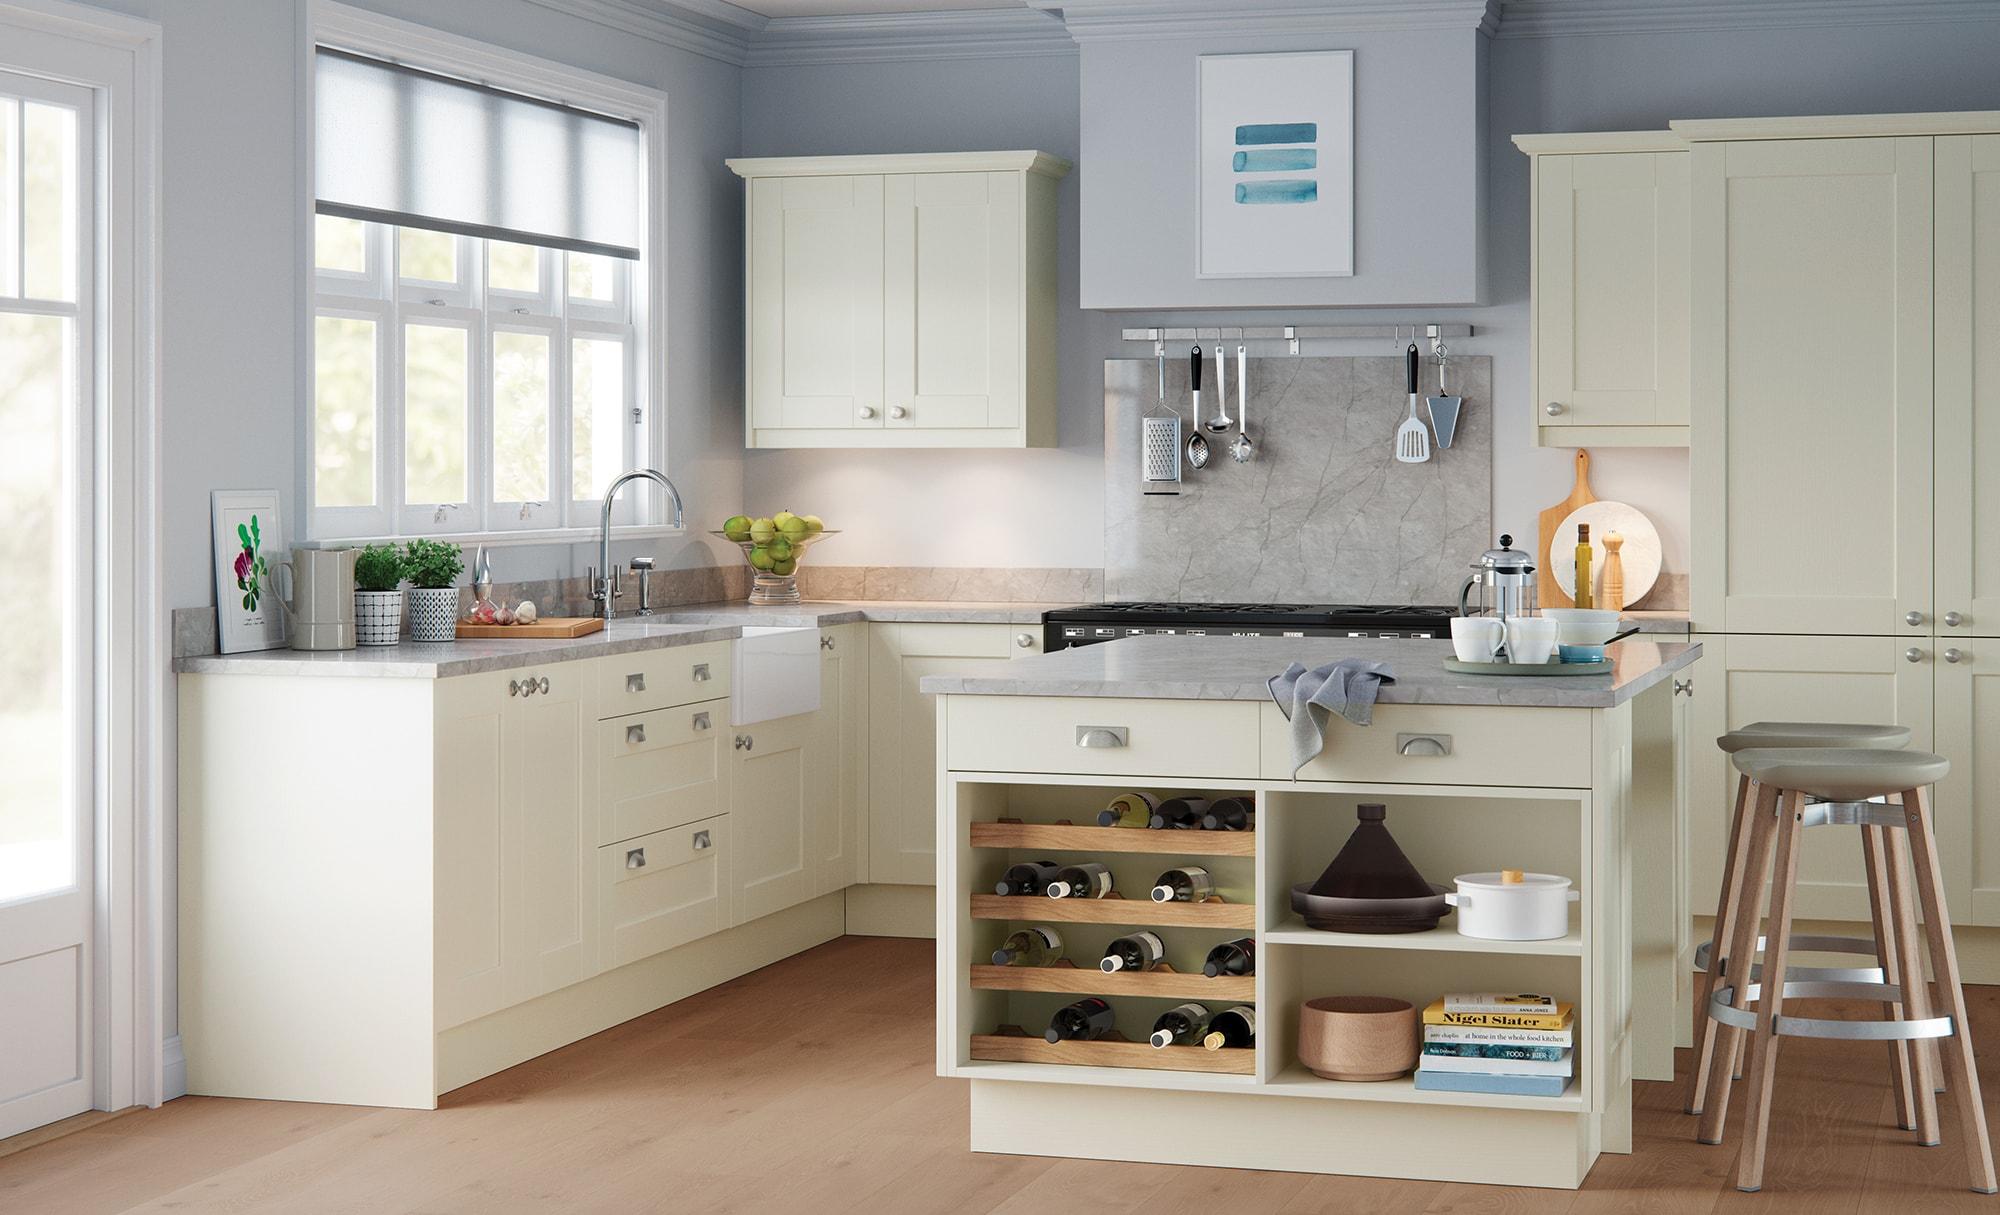 Classic Traditional Kitchen - Kensington Painted Porcelain Kitchen - Kitchen Design - Alan Kelly Kitchens - Waterford